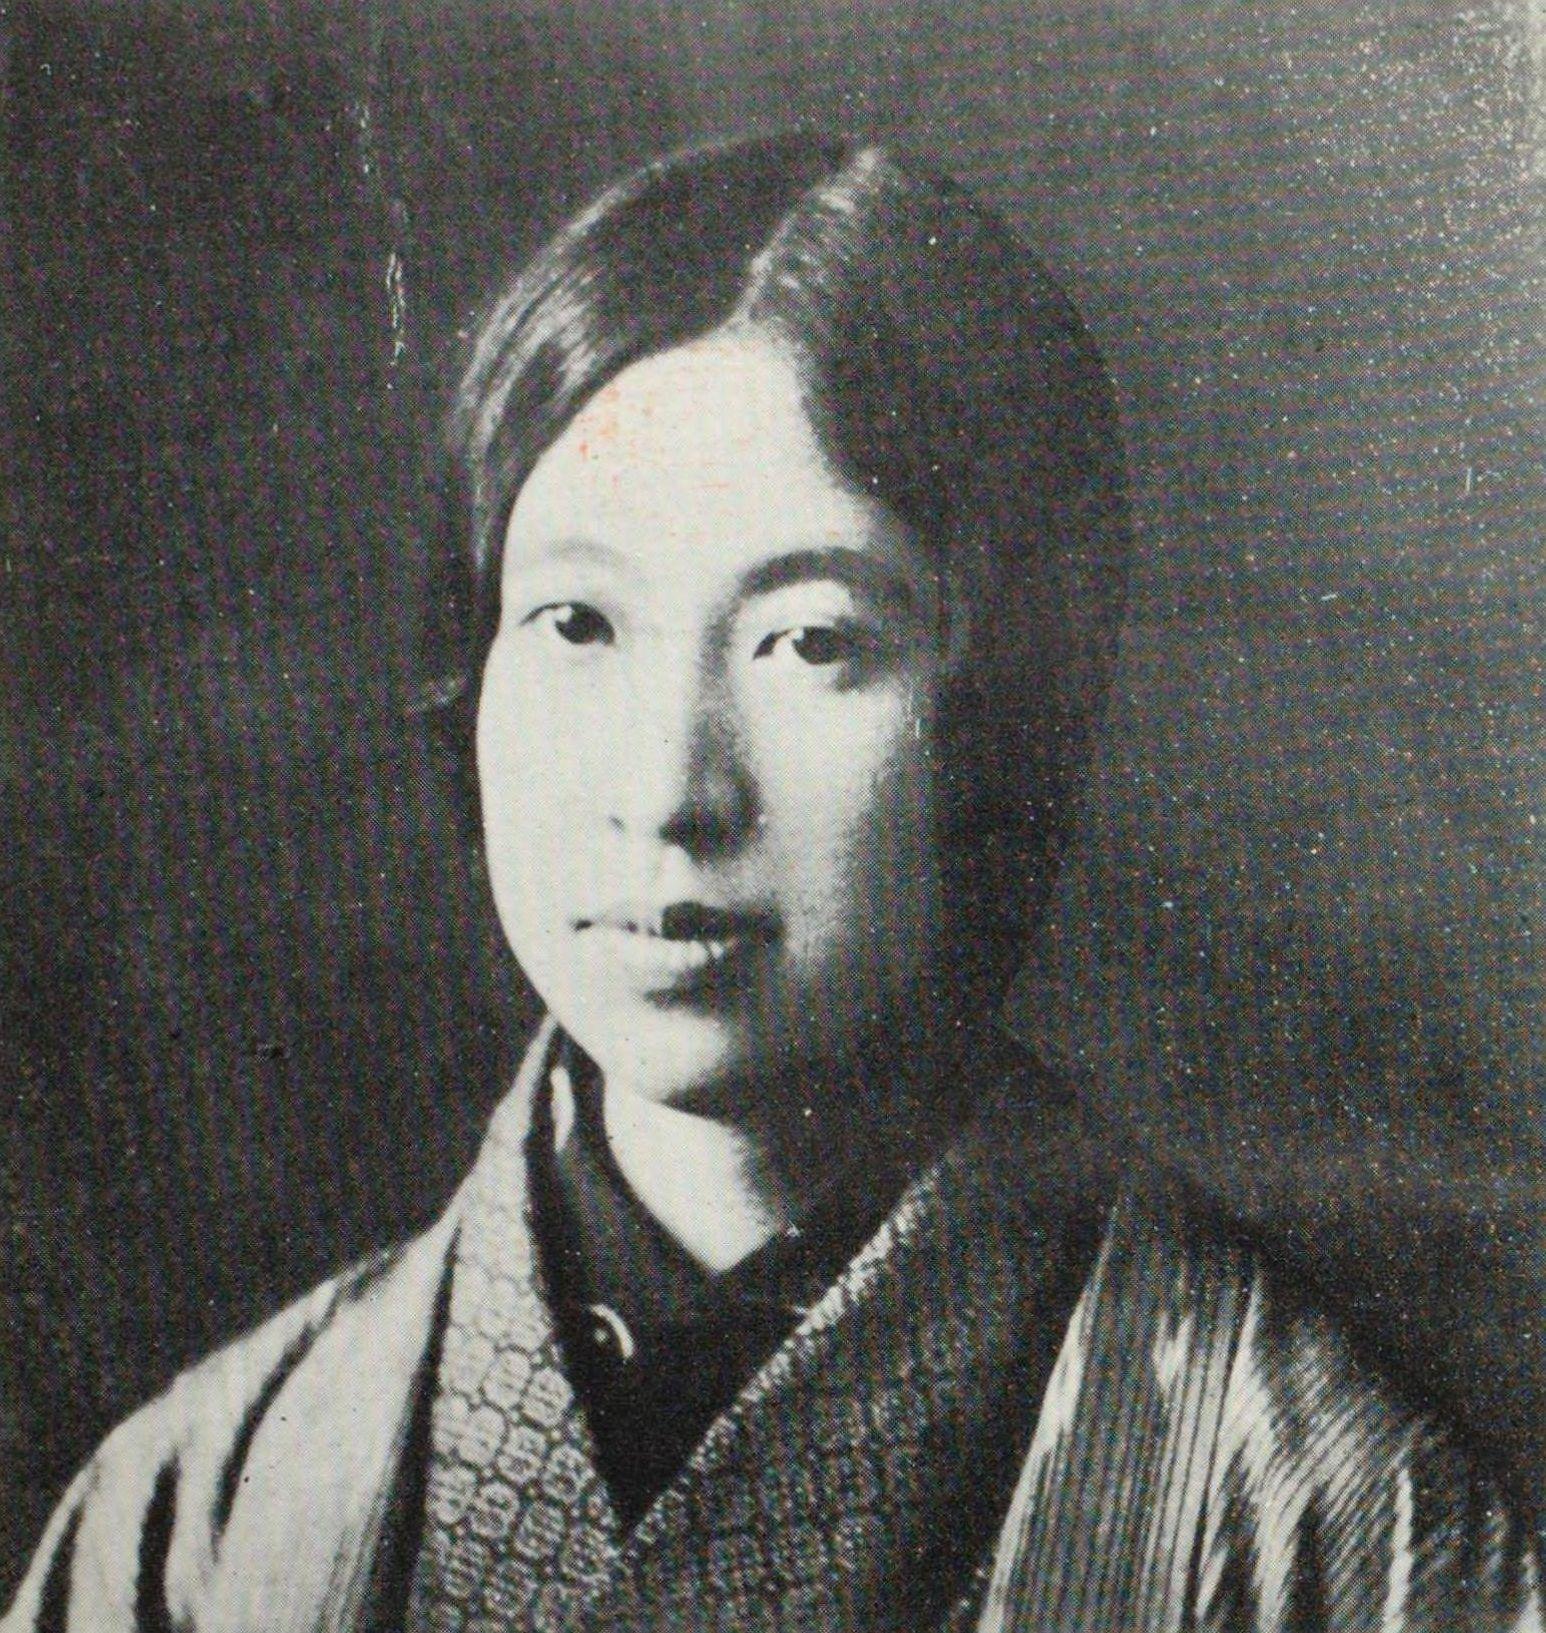 The young Hiratsuka Raichô